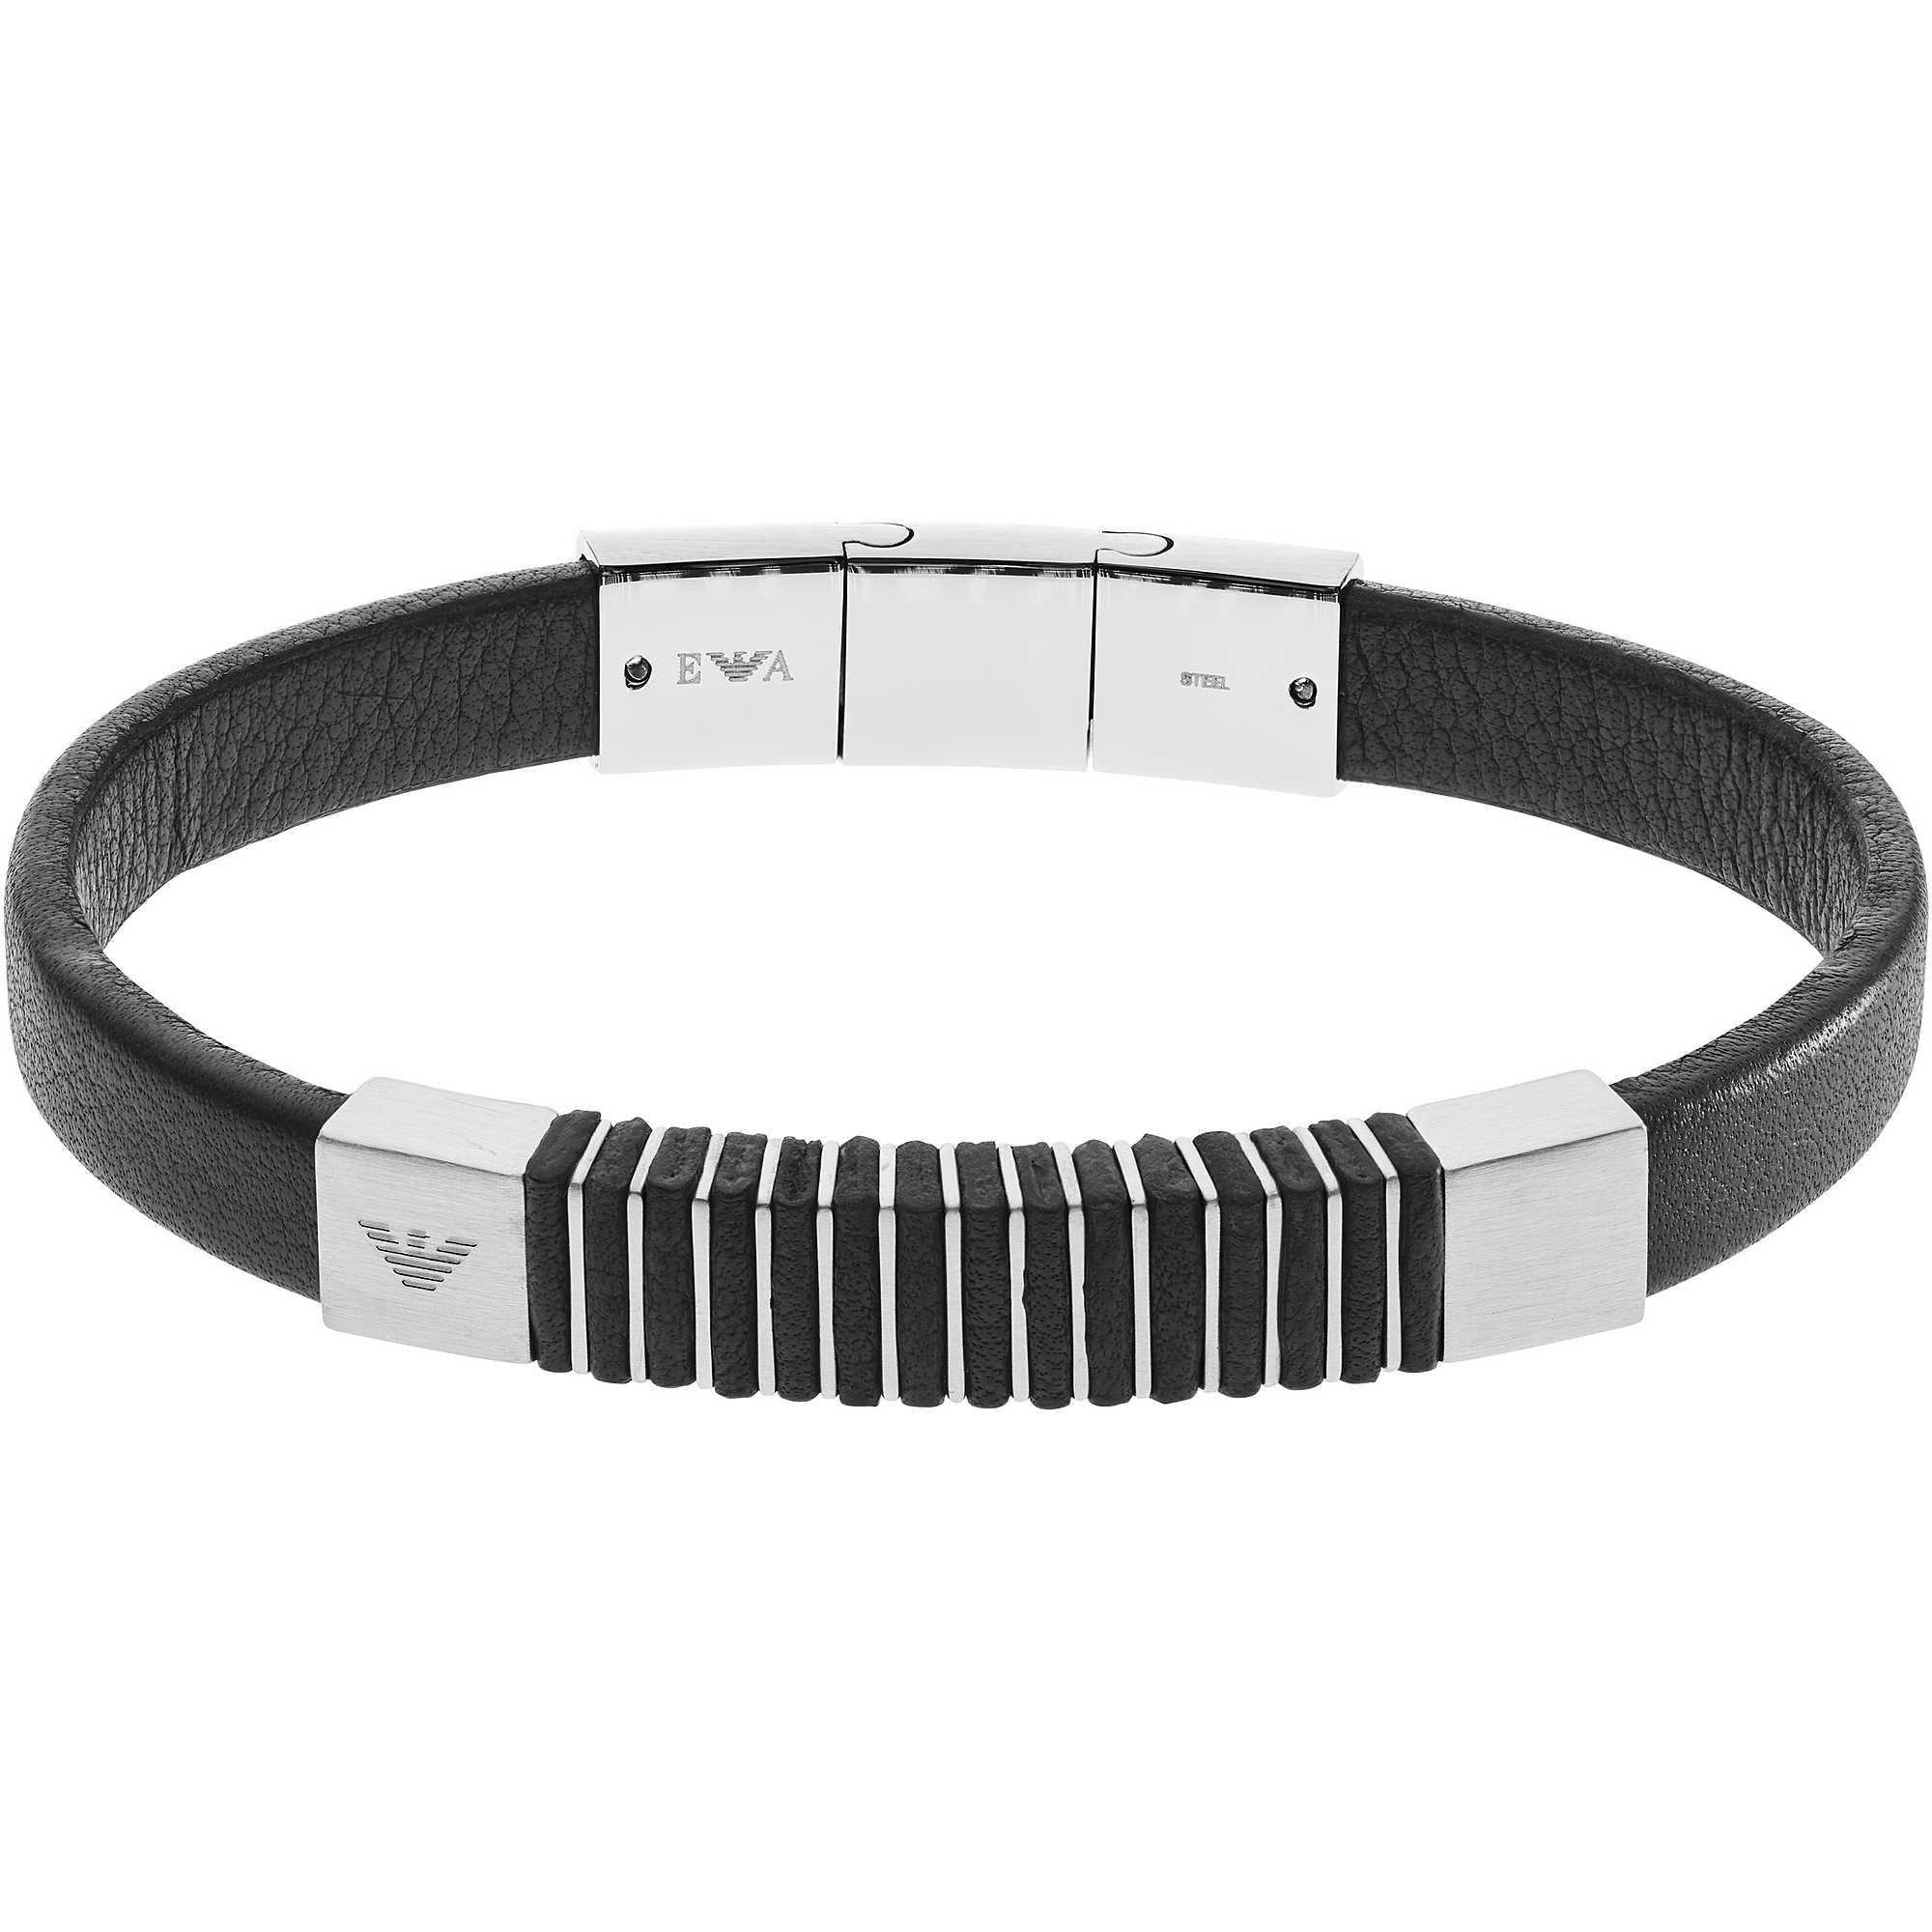 bracelet man jewellery Emporio Armani EGS2536040 bracelets Emporio ... 3e0a309b7d4